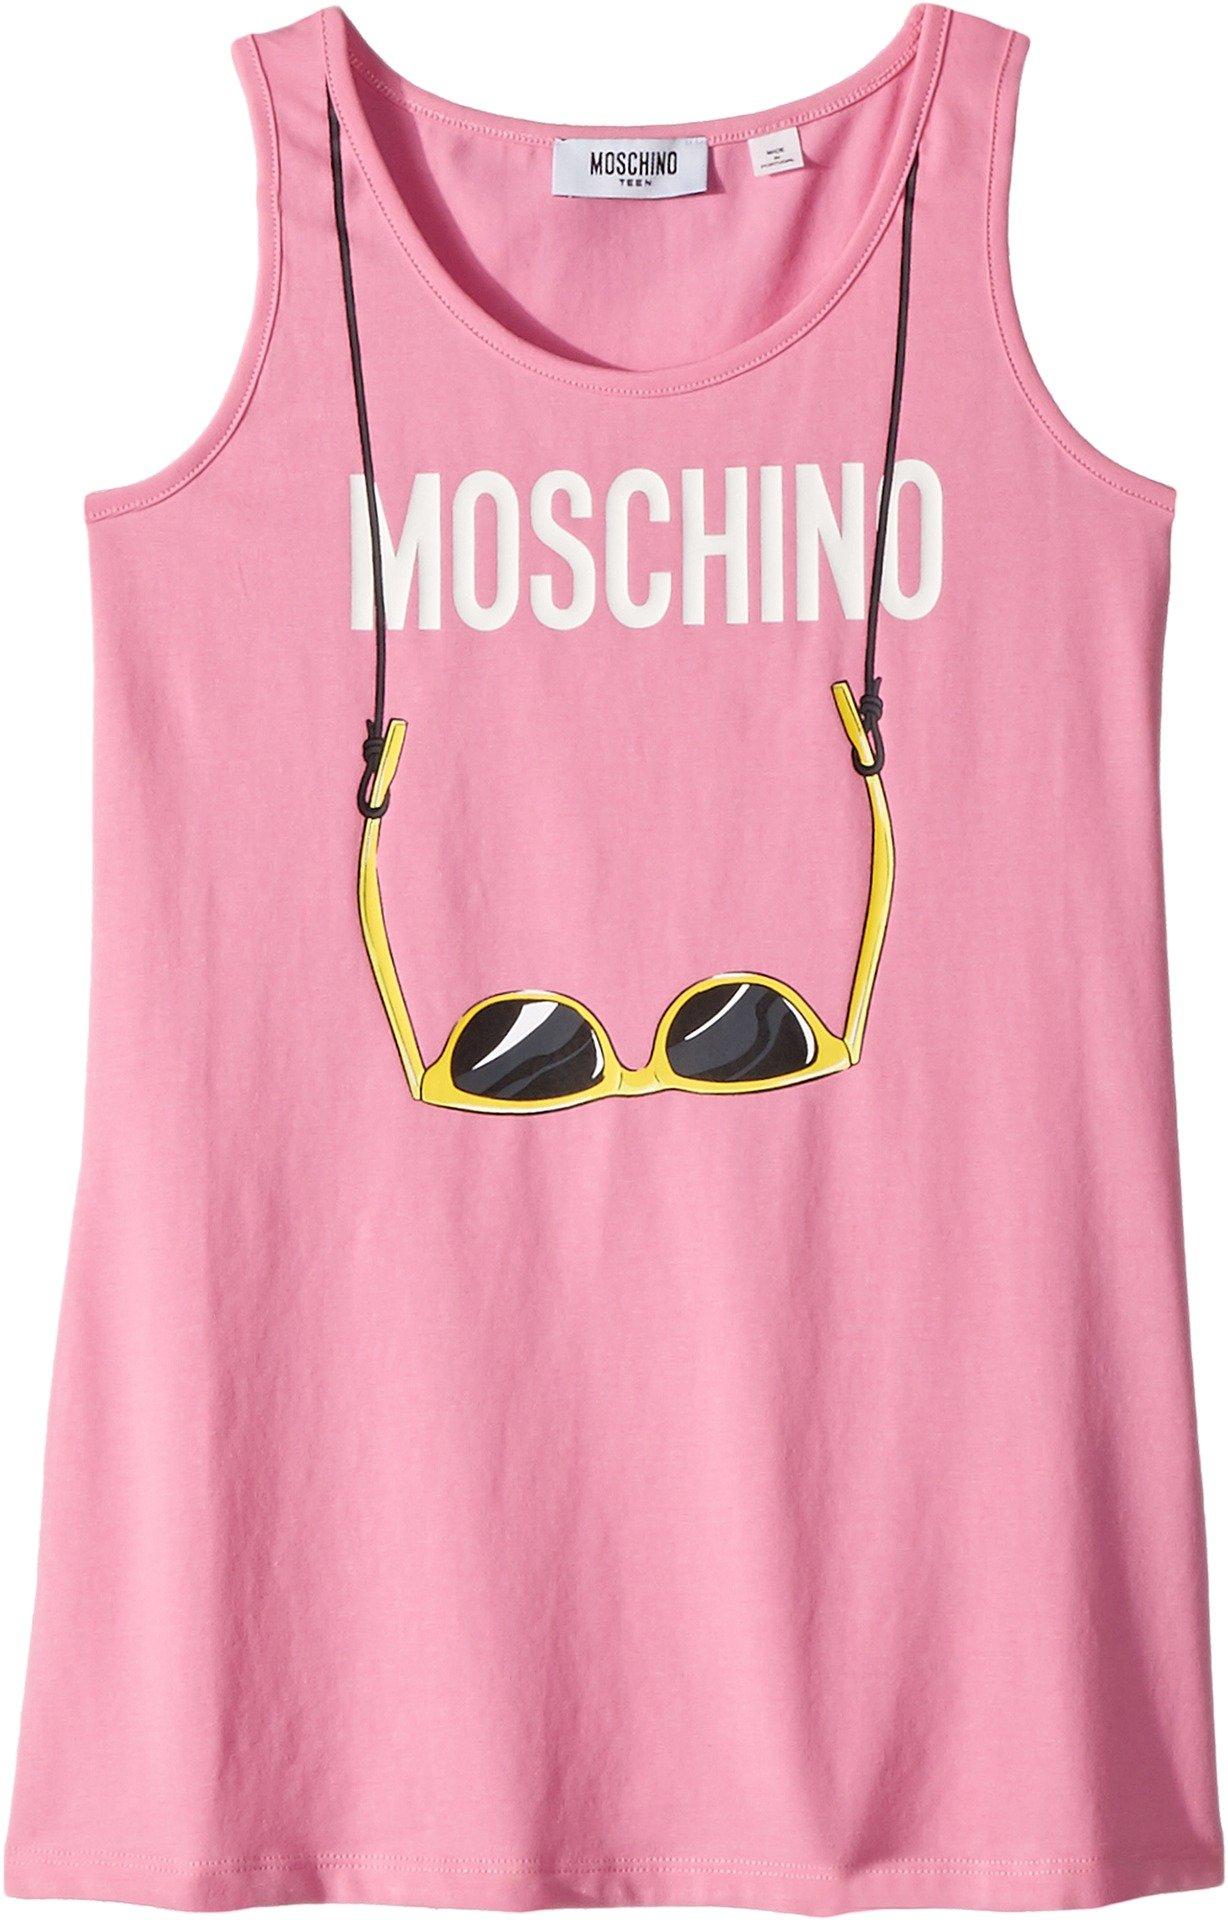 Moschino Kids Girl's Logo Sunglasses Graphic Tank Top (Big Kids) Rosa Pop 12